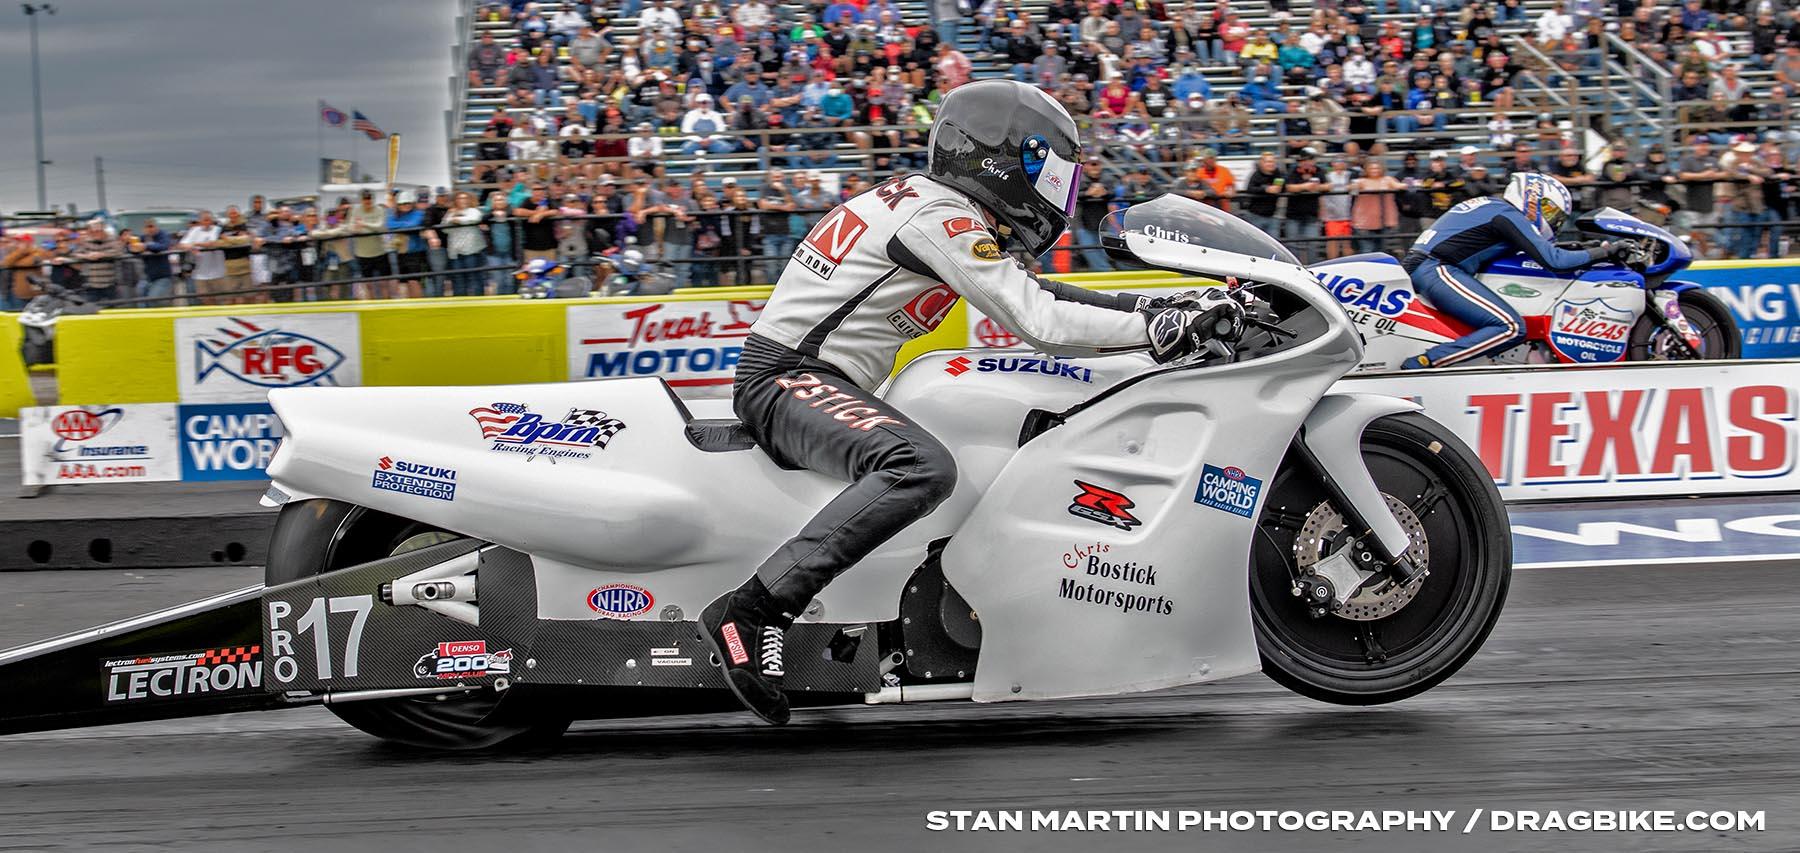 Chris Bostick - NHRA Pro Stock Motorcycle